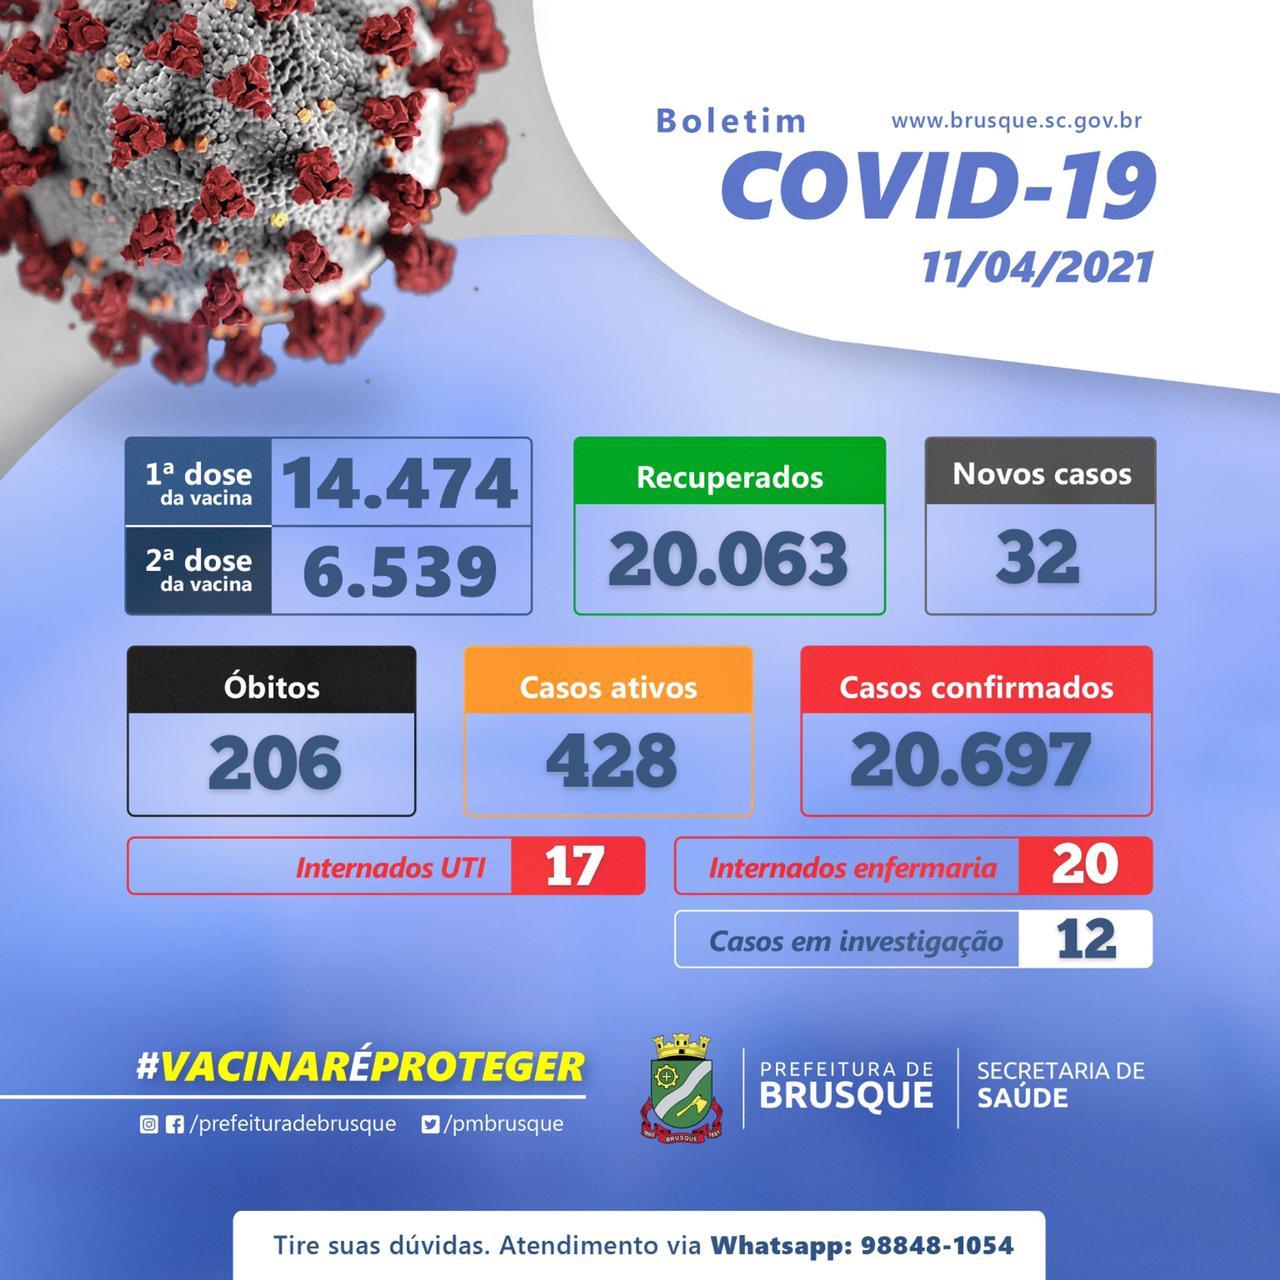 Covid-19: Boletim epidemiológico domingo (11/04)